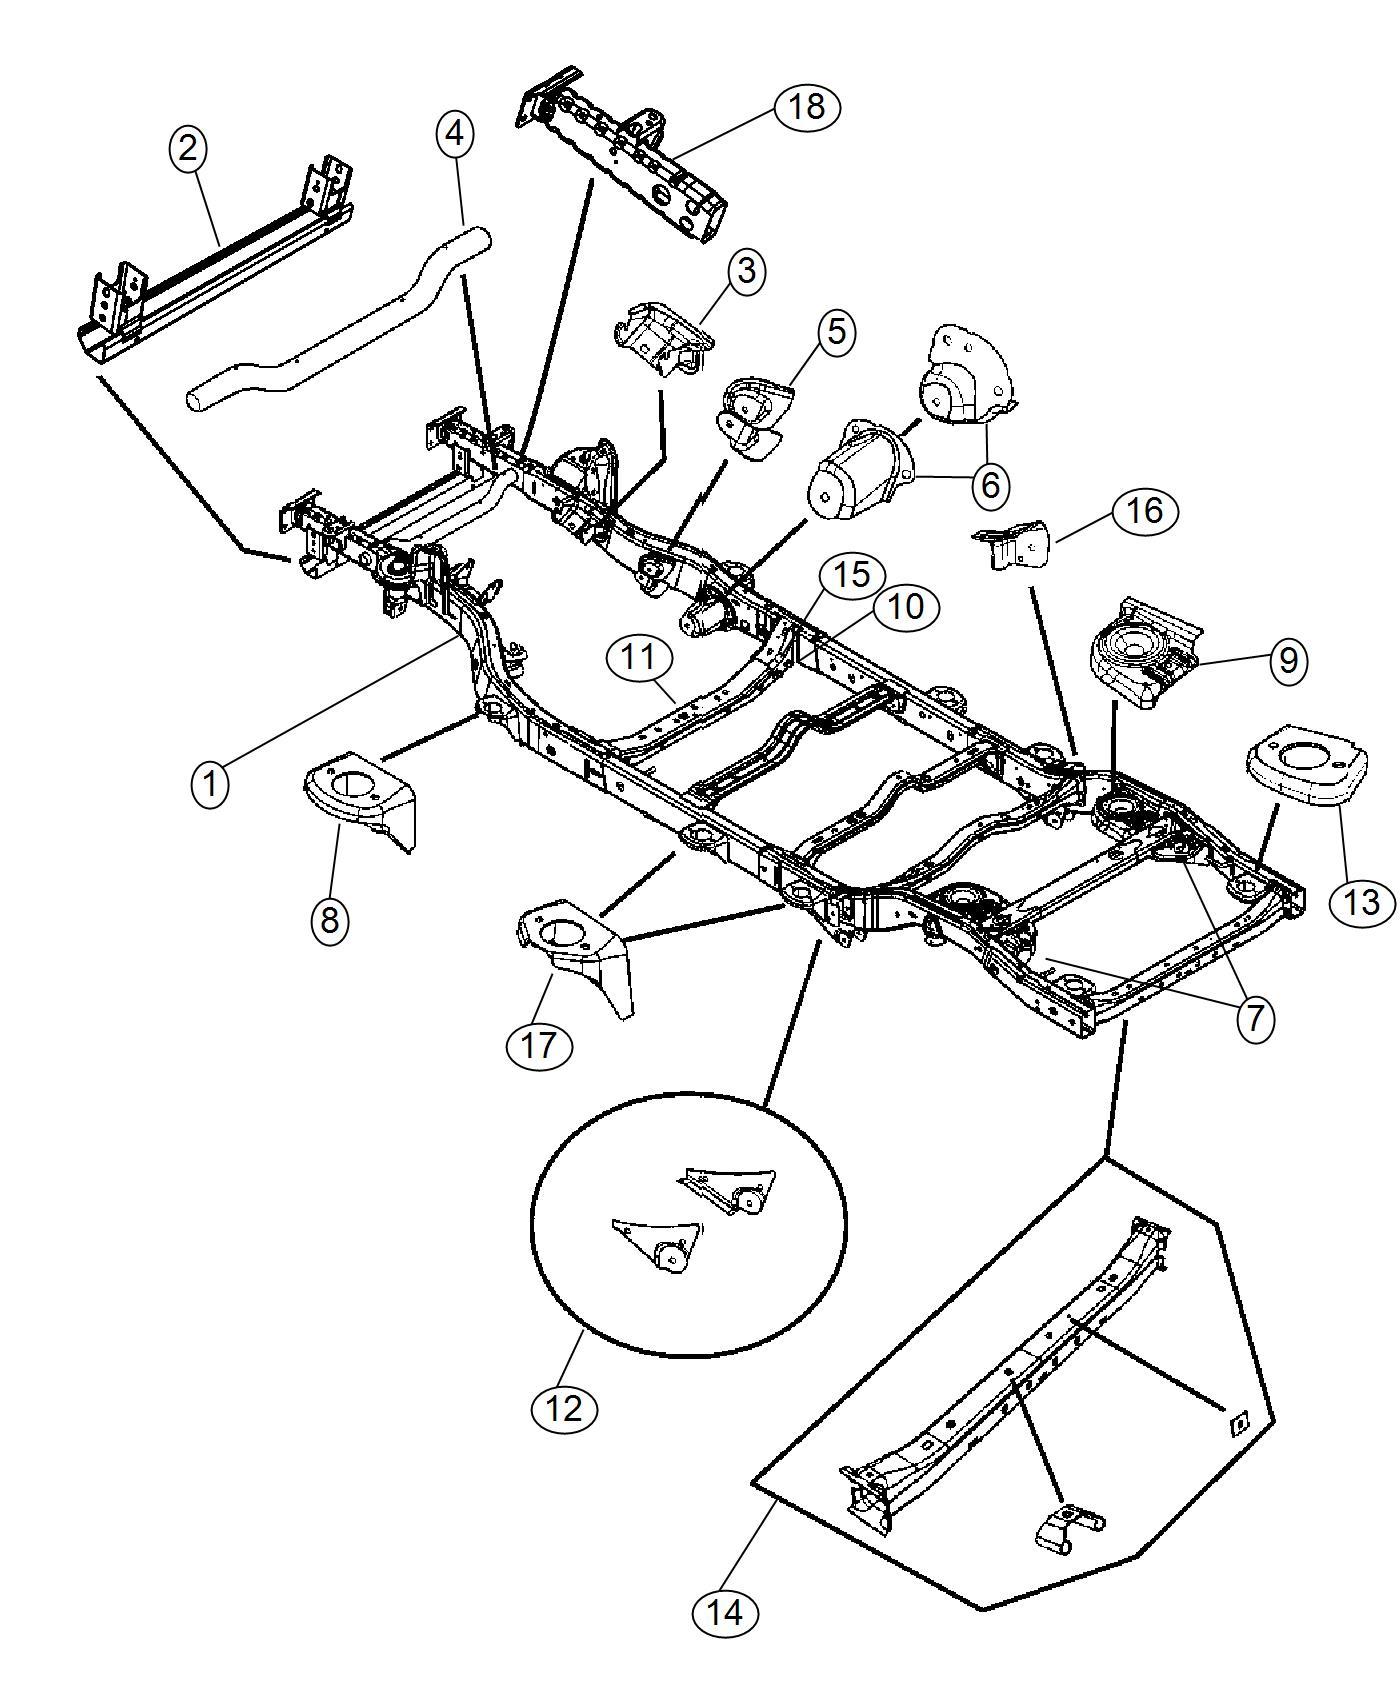 2004 Jeep Wrangler Frame. Chassis. [3.0l v6 24v vvt engine